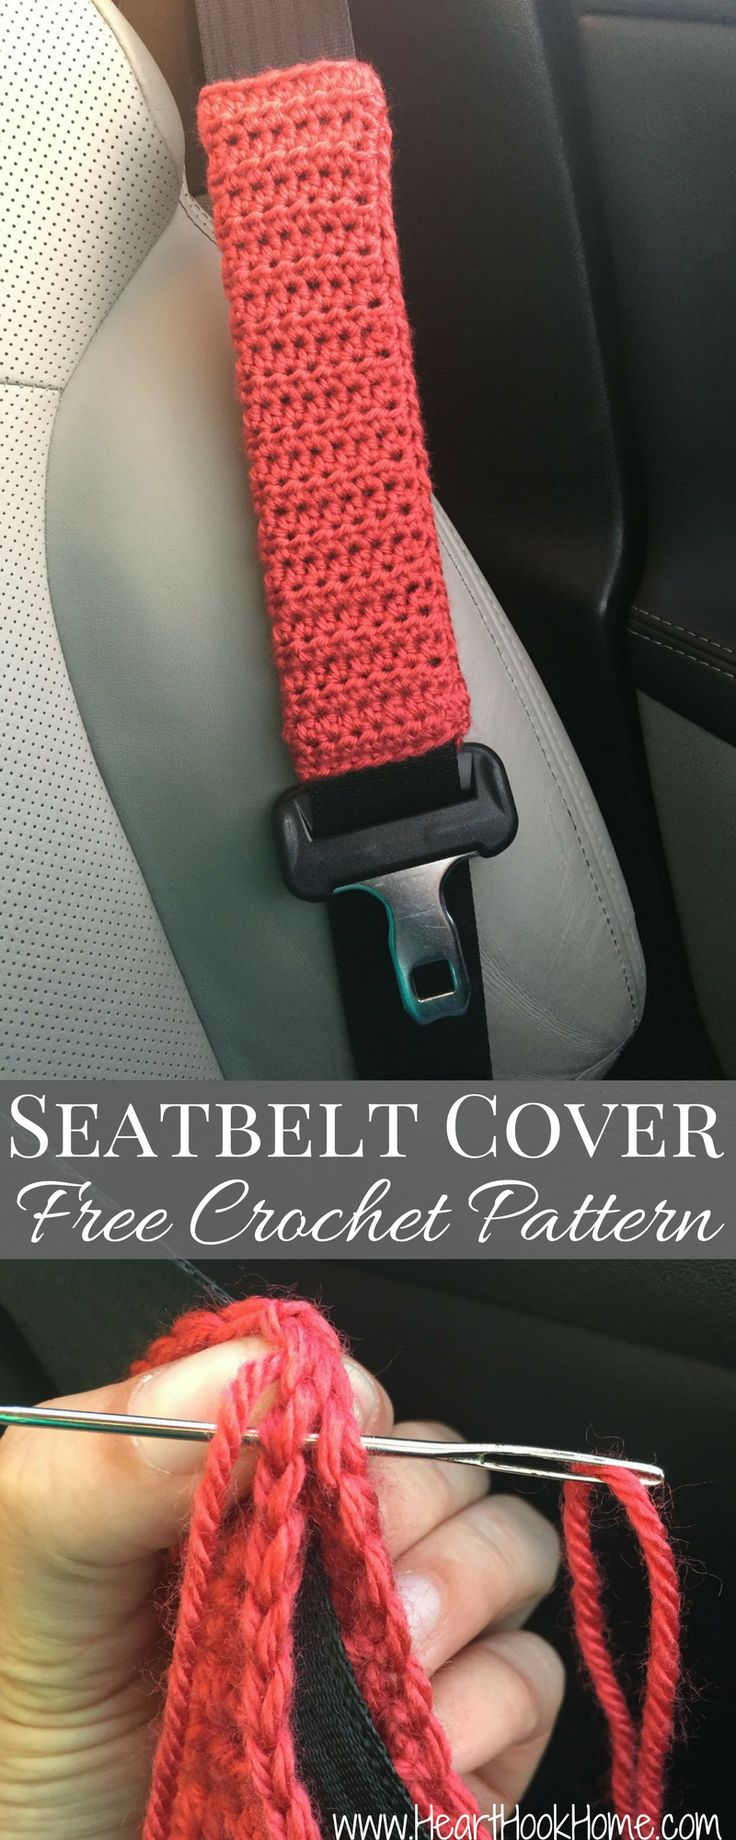 Seatbelt Cover Free Crochet Pattern http://hearthookhome.com/free-crochet-pattern-seatbelt-cover/?utm_campaign=coschedule&utm_source=pinterest&utm_medium=Ashlea%20K%20-%20Heart%2C%20Hook%2C%20Home&utm_content=Seatbelt%20Cover%20Free%20Crochet%20Pattern